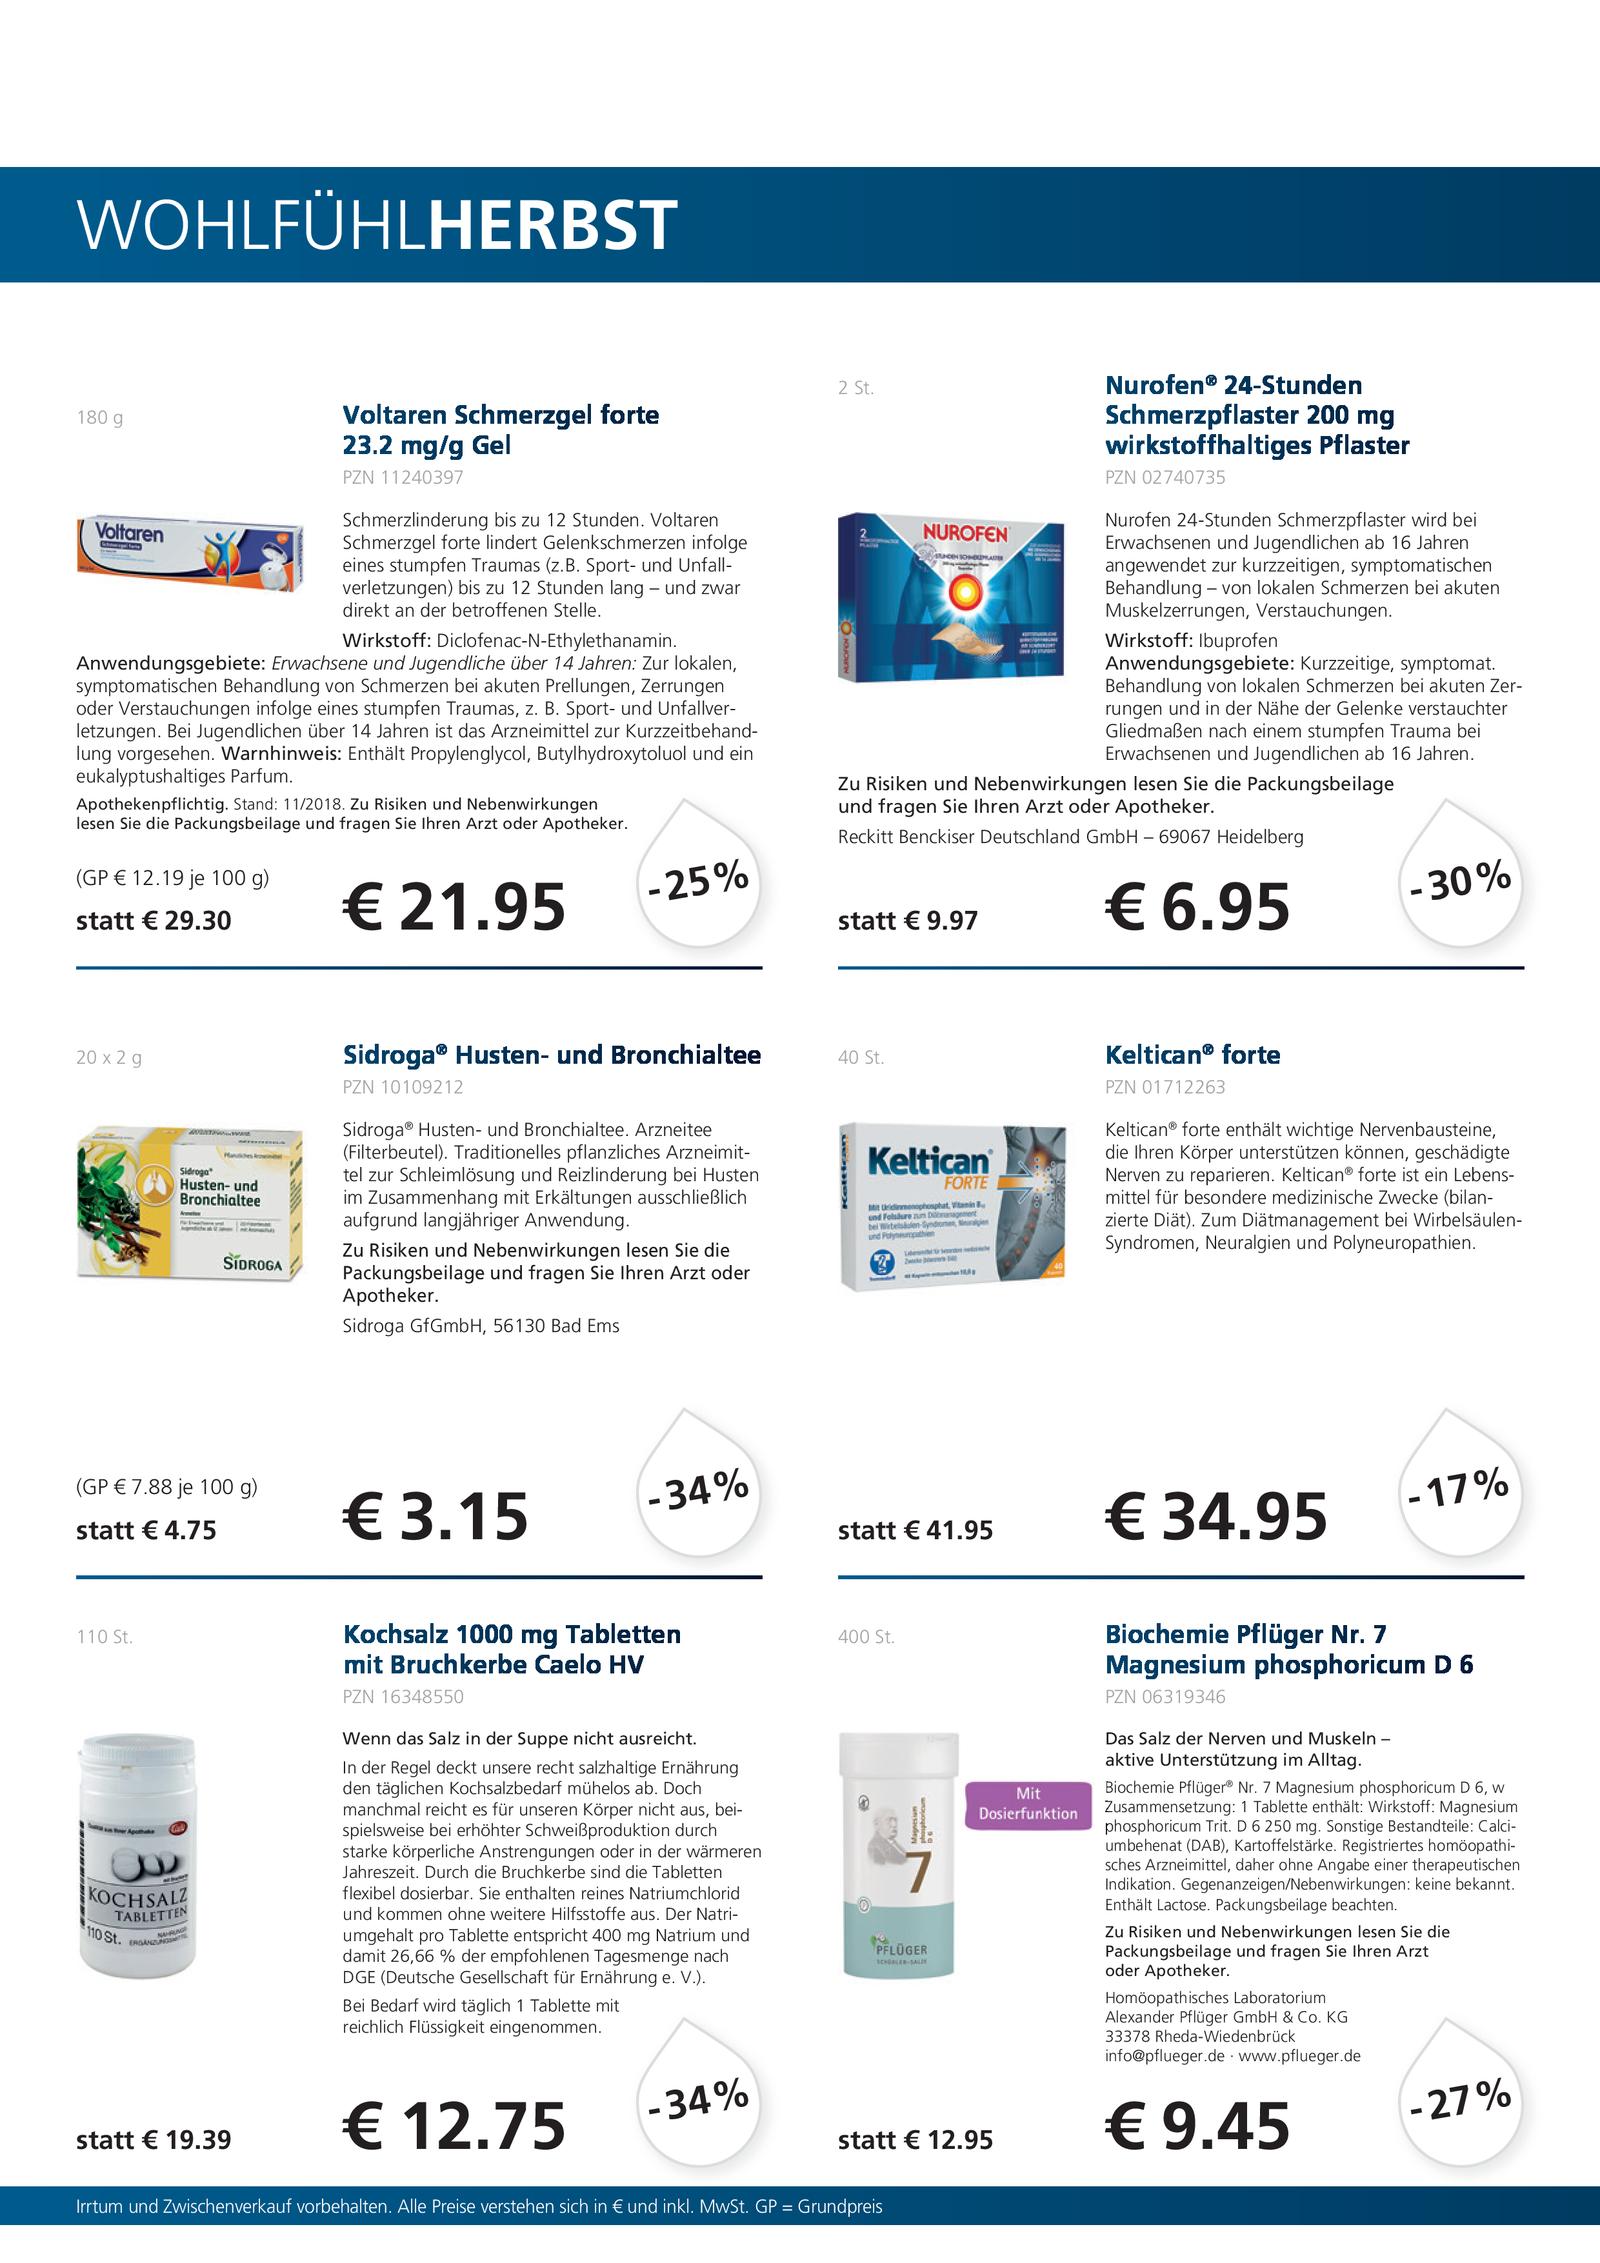 https://mein-uploads.apocdn.net/9396/leaflets/9396_flyer-Seite2.png